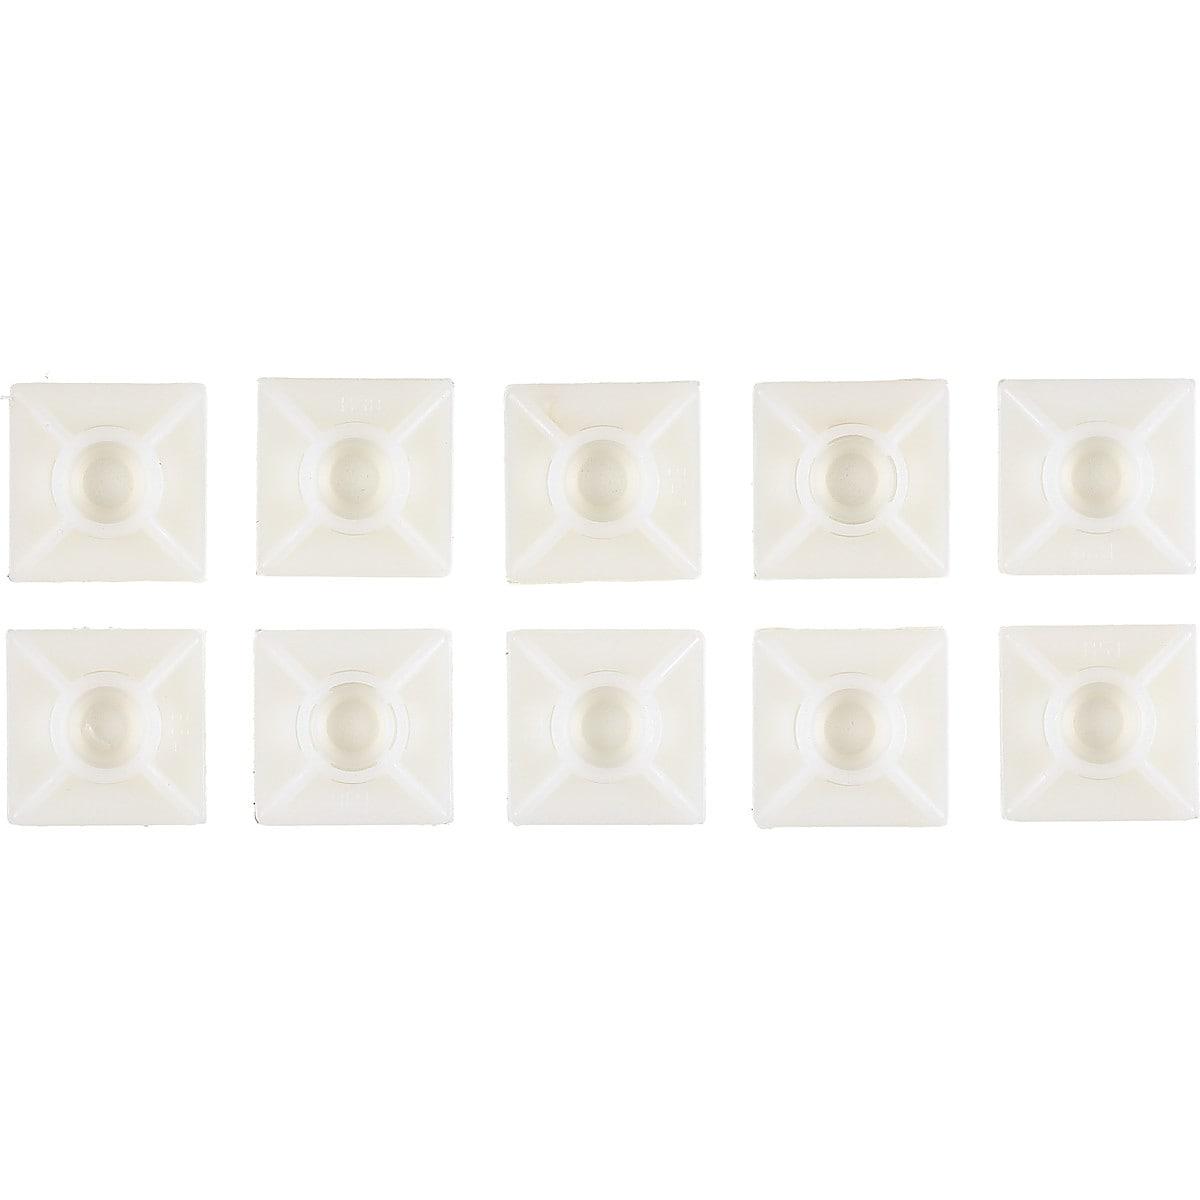 Buntebåndsanker 19 x 19 mm, 10-pack